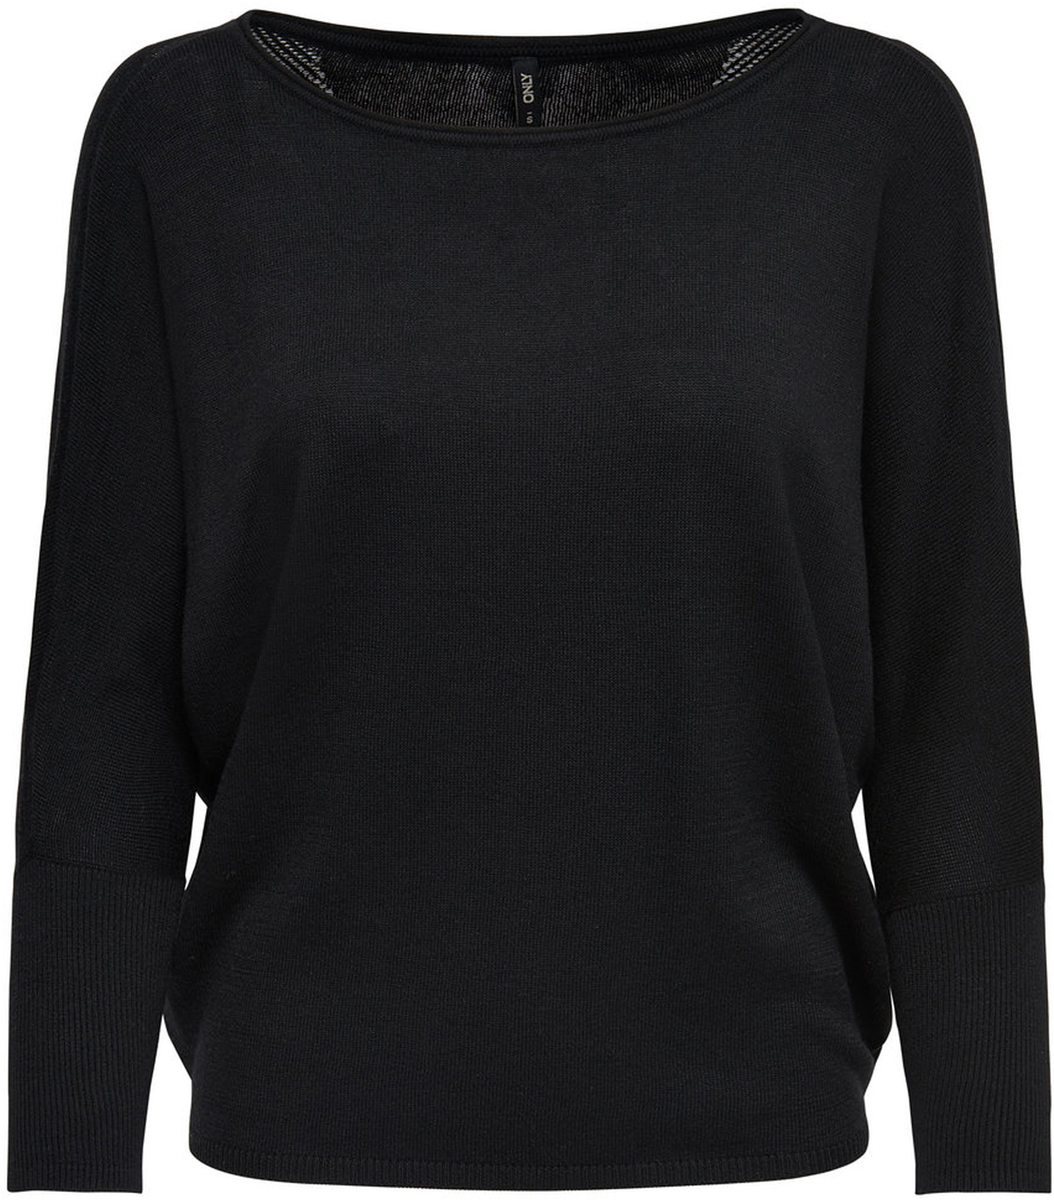 Пуловер жен Only, цвет: черный. 15140104_Black. Размер XS (40/42)15140104_Black